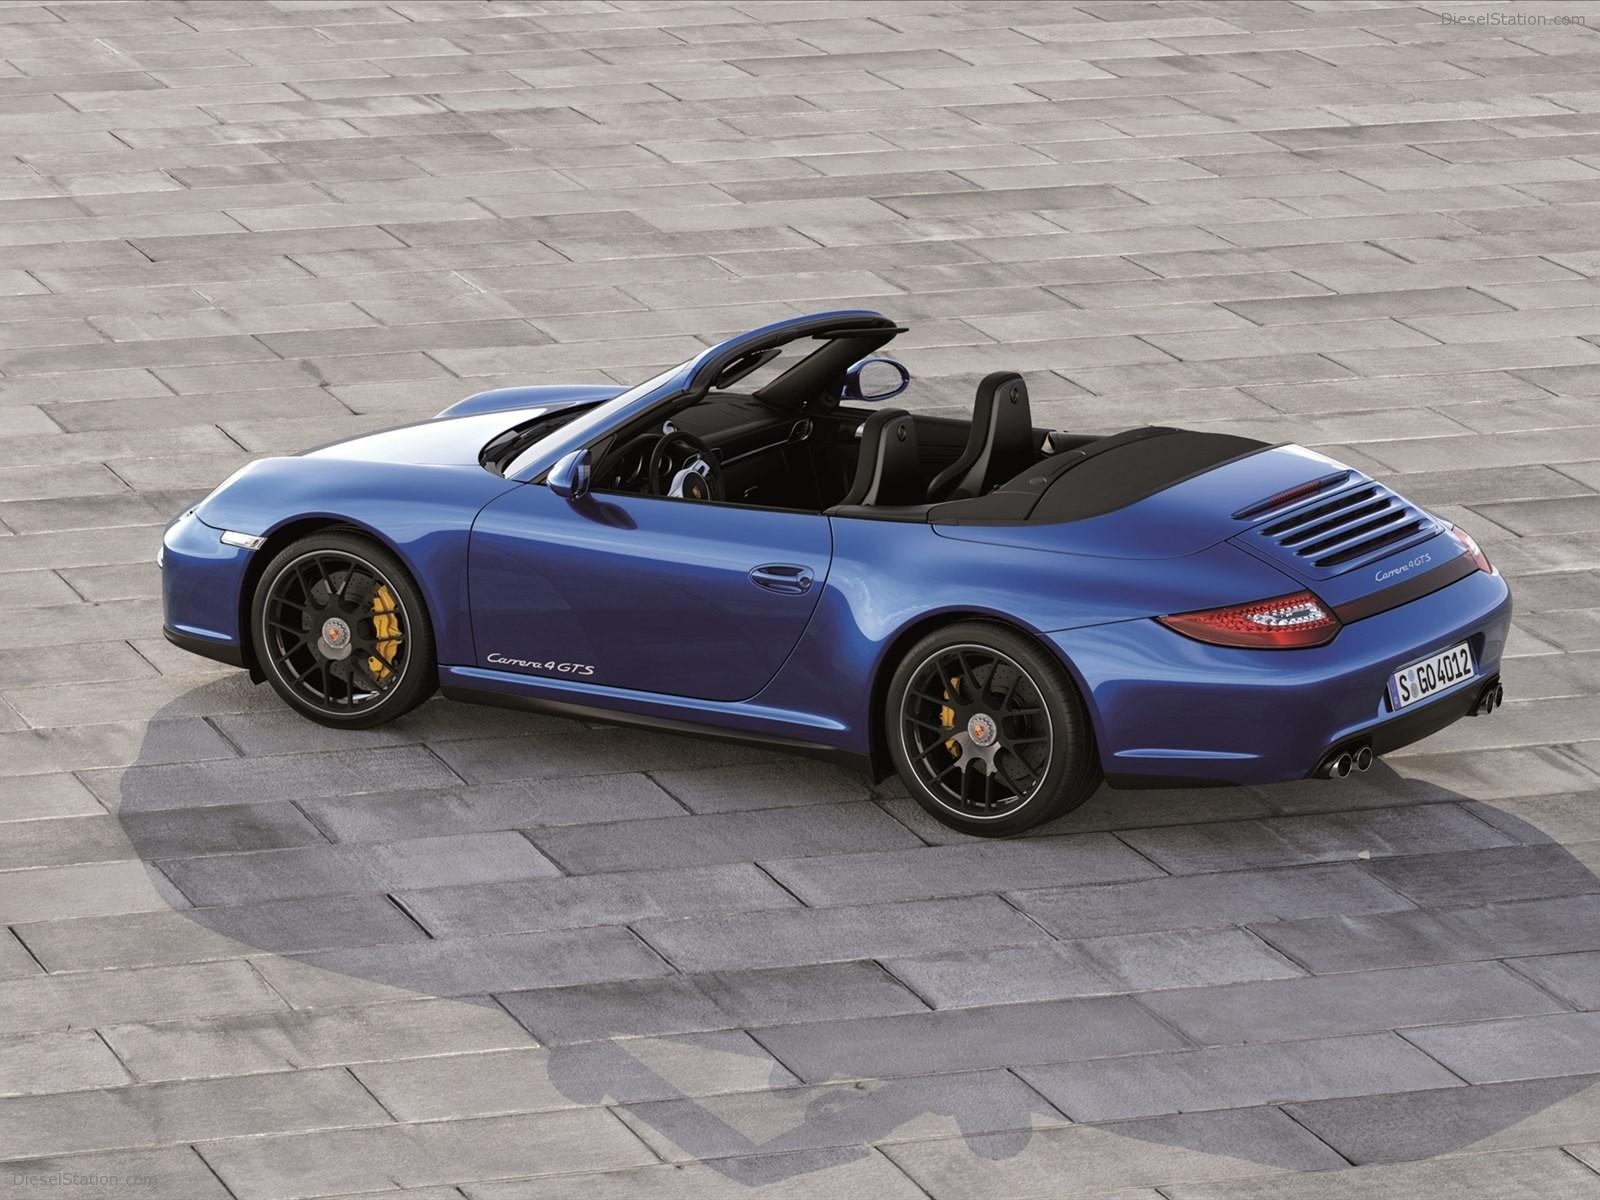 Home Porsche Porsche 911 Carrera 4 GTS Cabriolet 2012 1600x1200